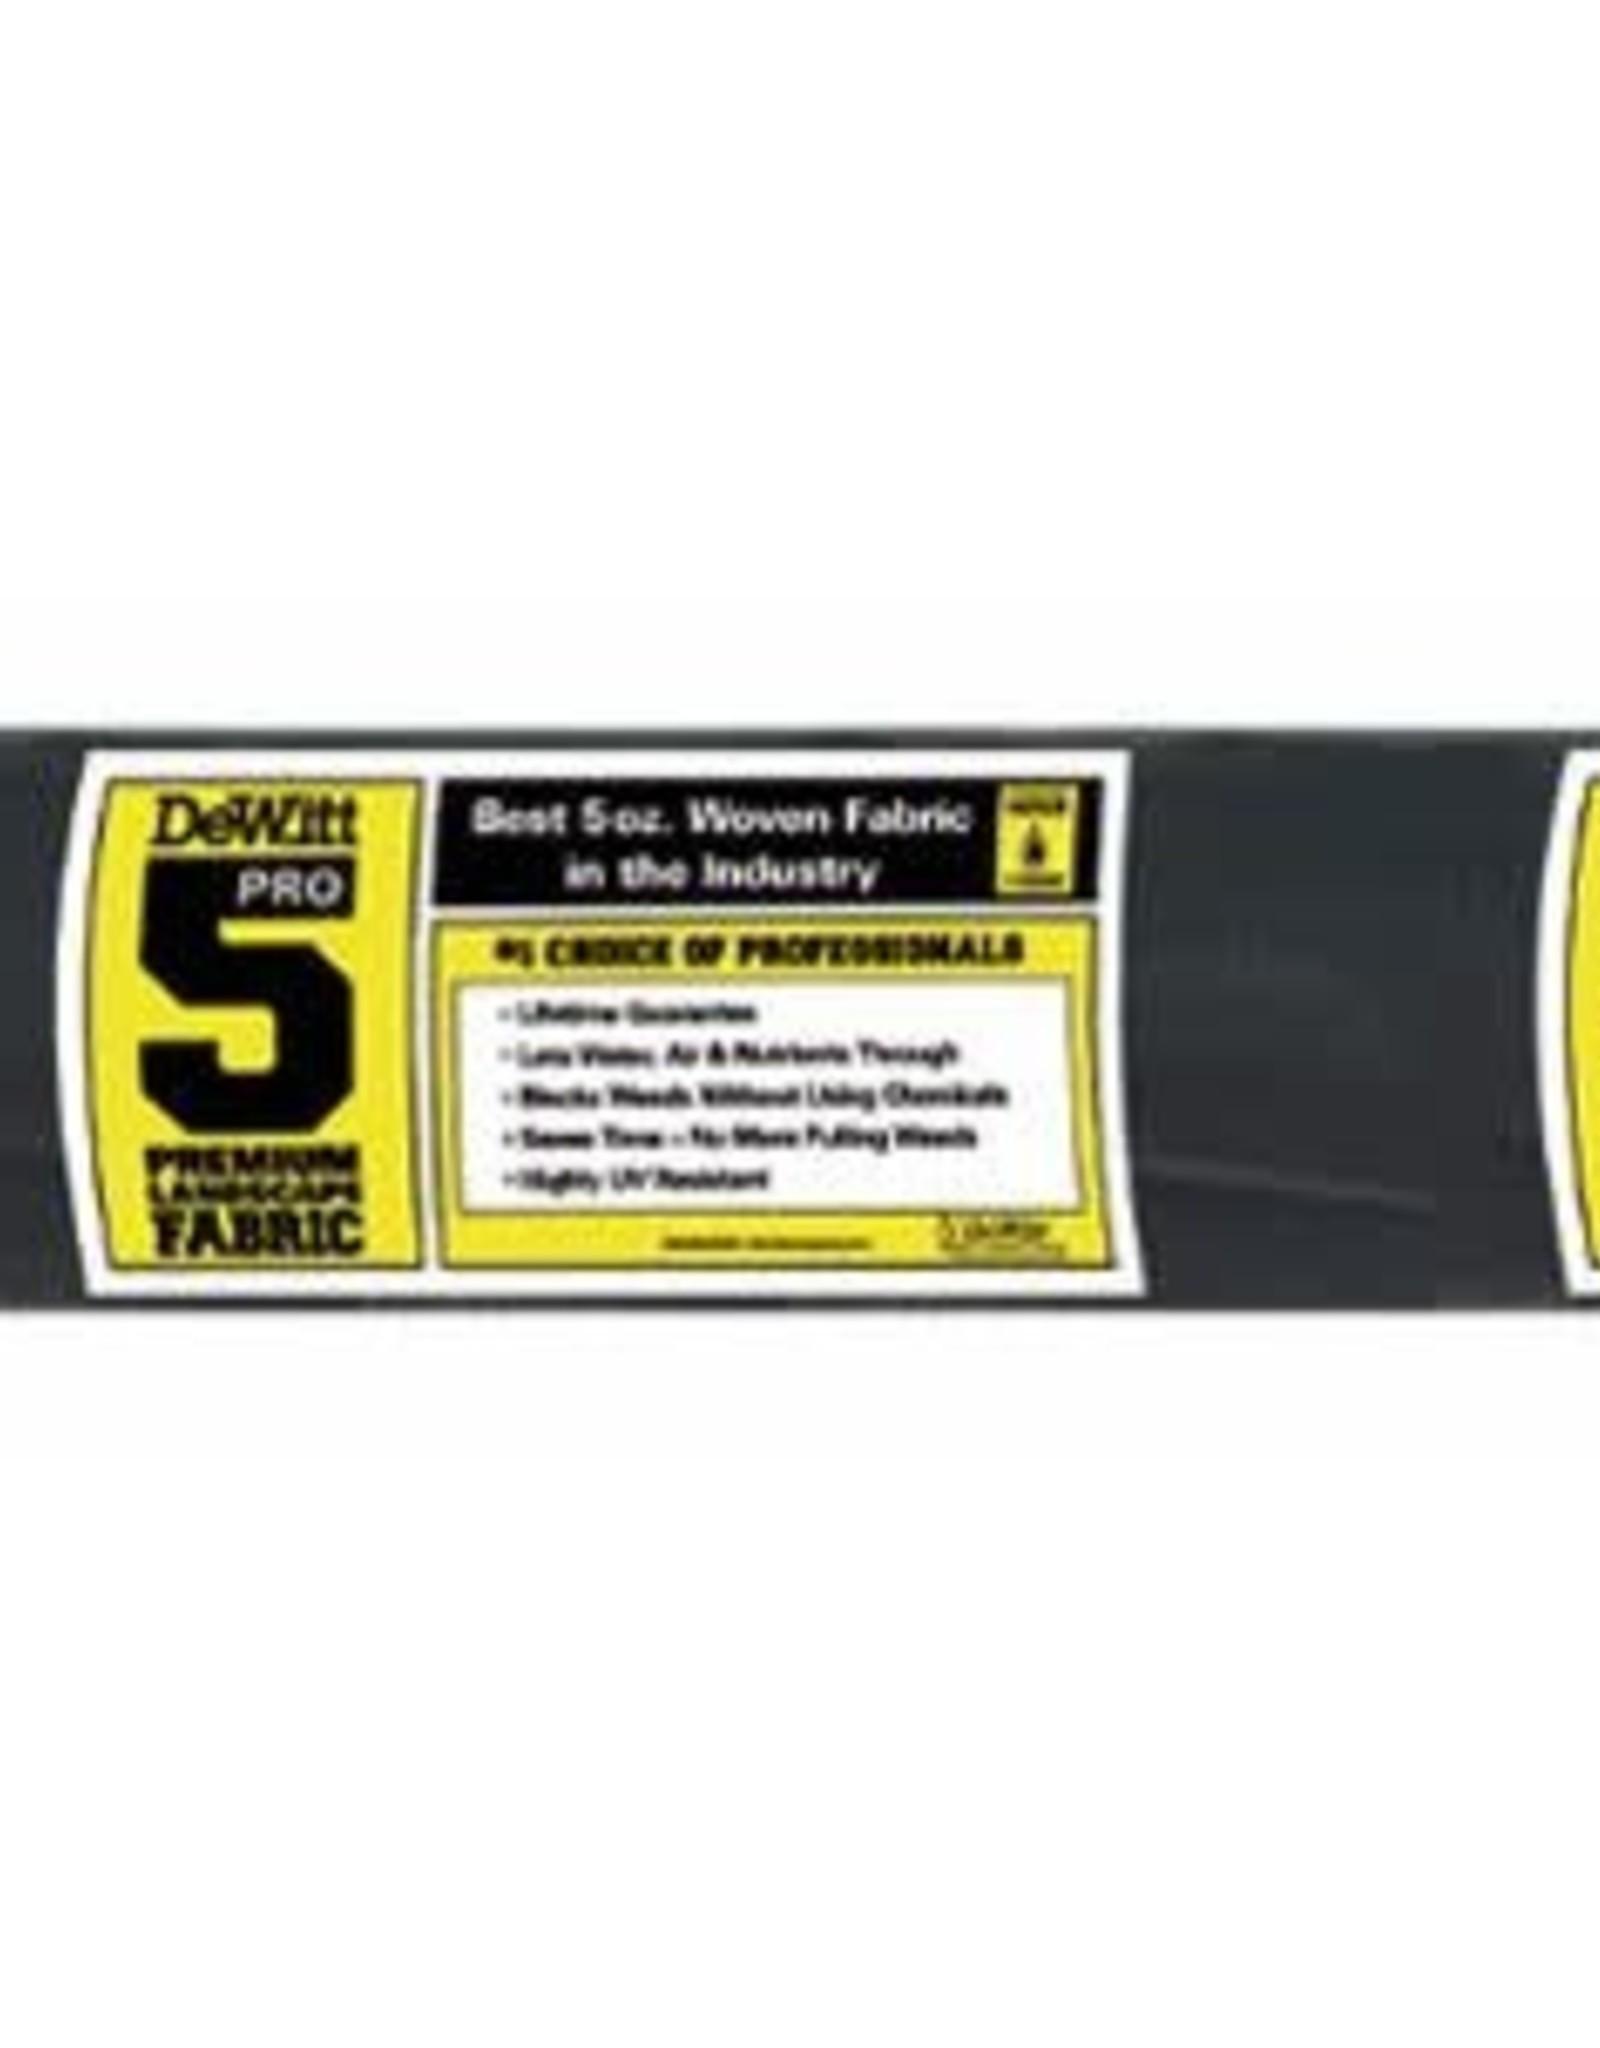 DeWitt 5 oz.  4'x250'  Pro 5 Barrier Farbric